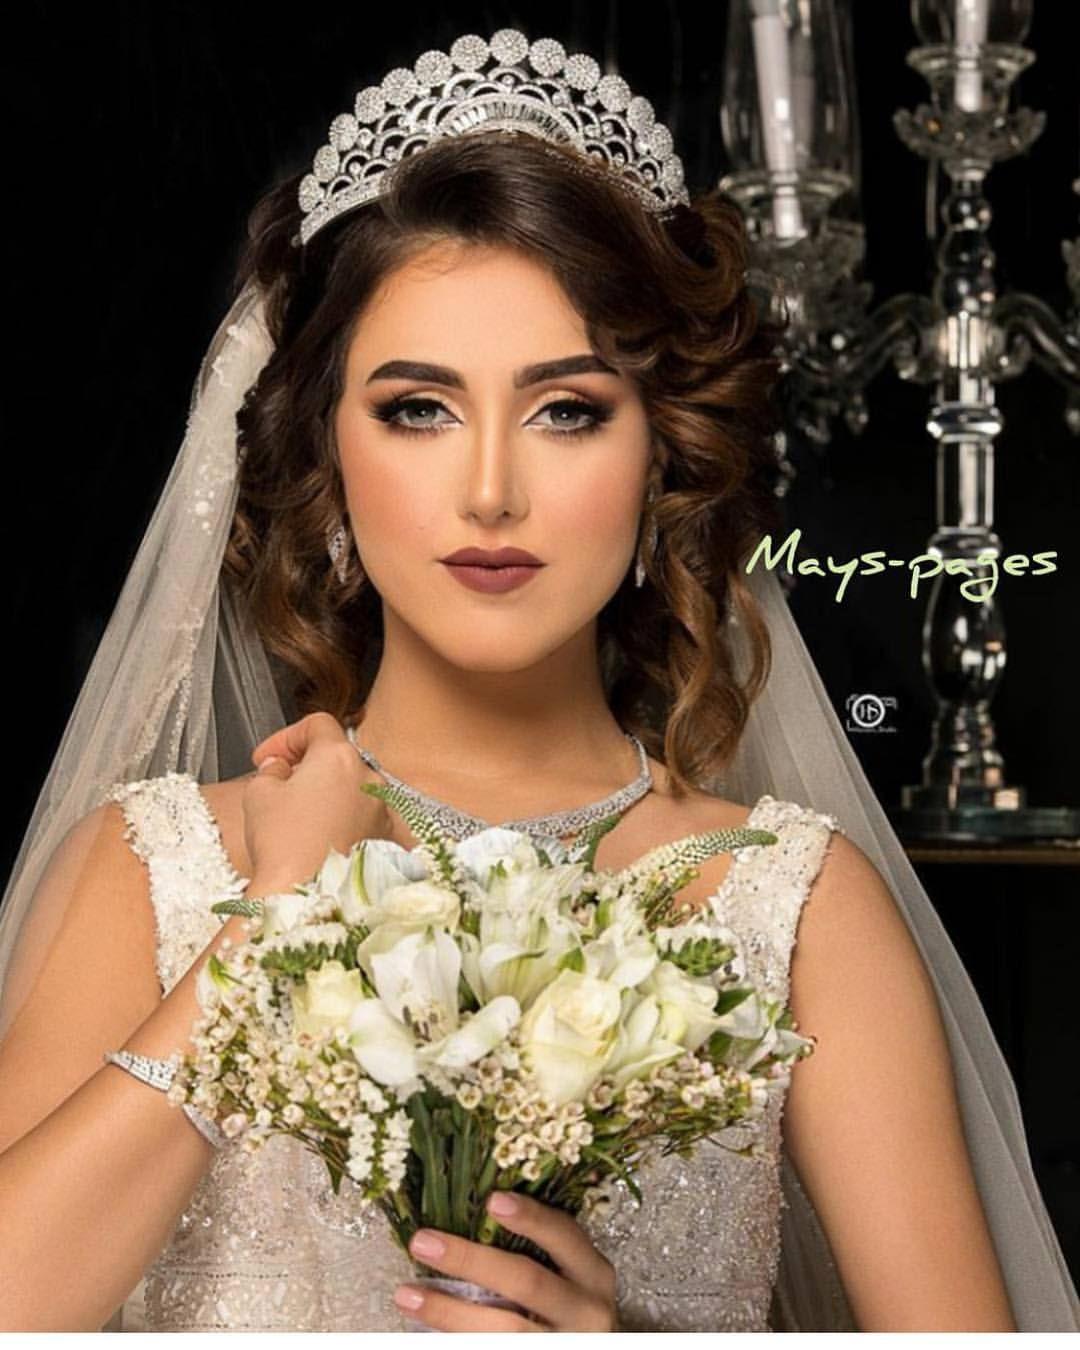 Dr Yaramedhat من افضل عيادات التجميل Dr Yaramedhat Snap Dr Yaramedhat ماجستير جلدية و تناسلية دبل Wedding Dresses Lace Wedding Styles Wedding Dresses